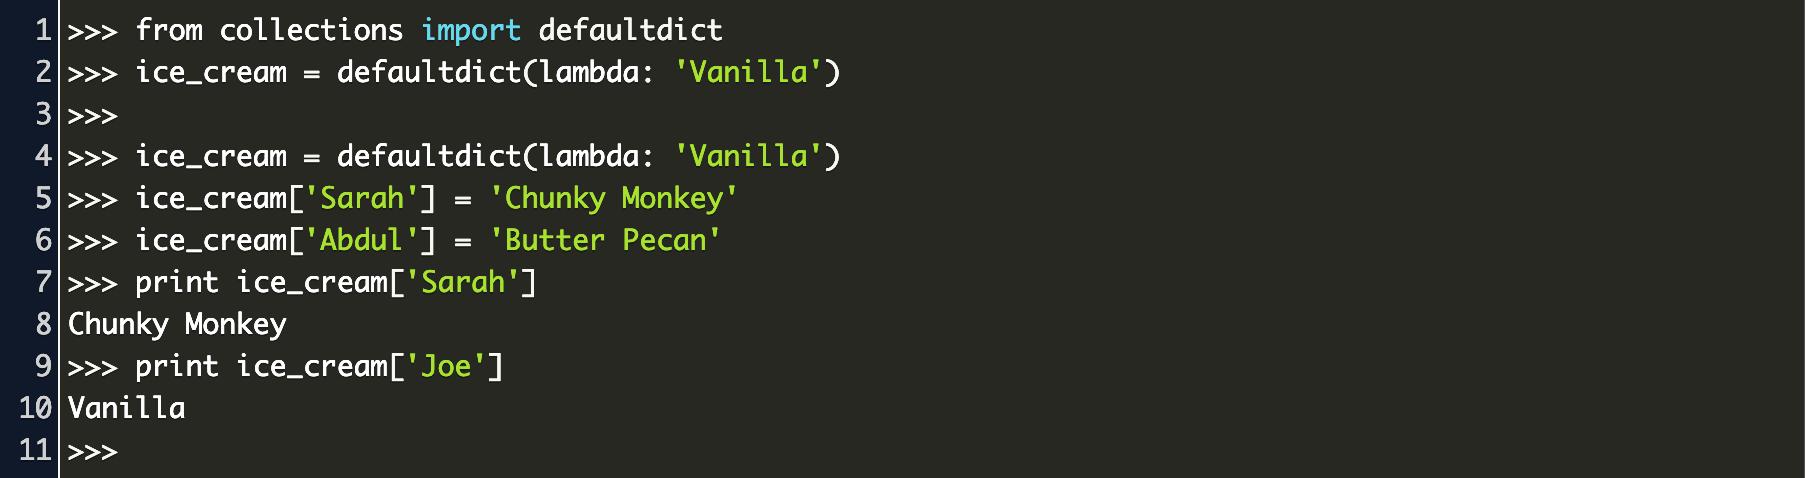 python defaultdict Code Example